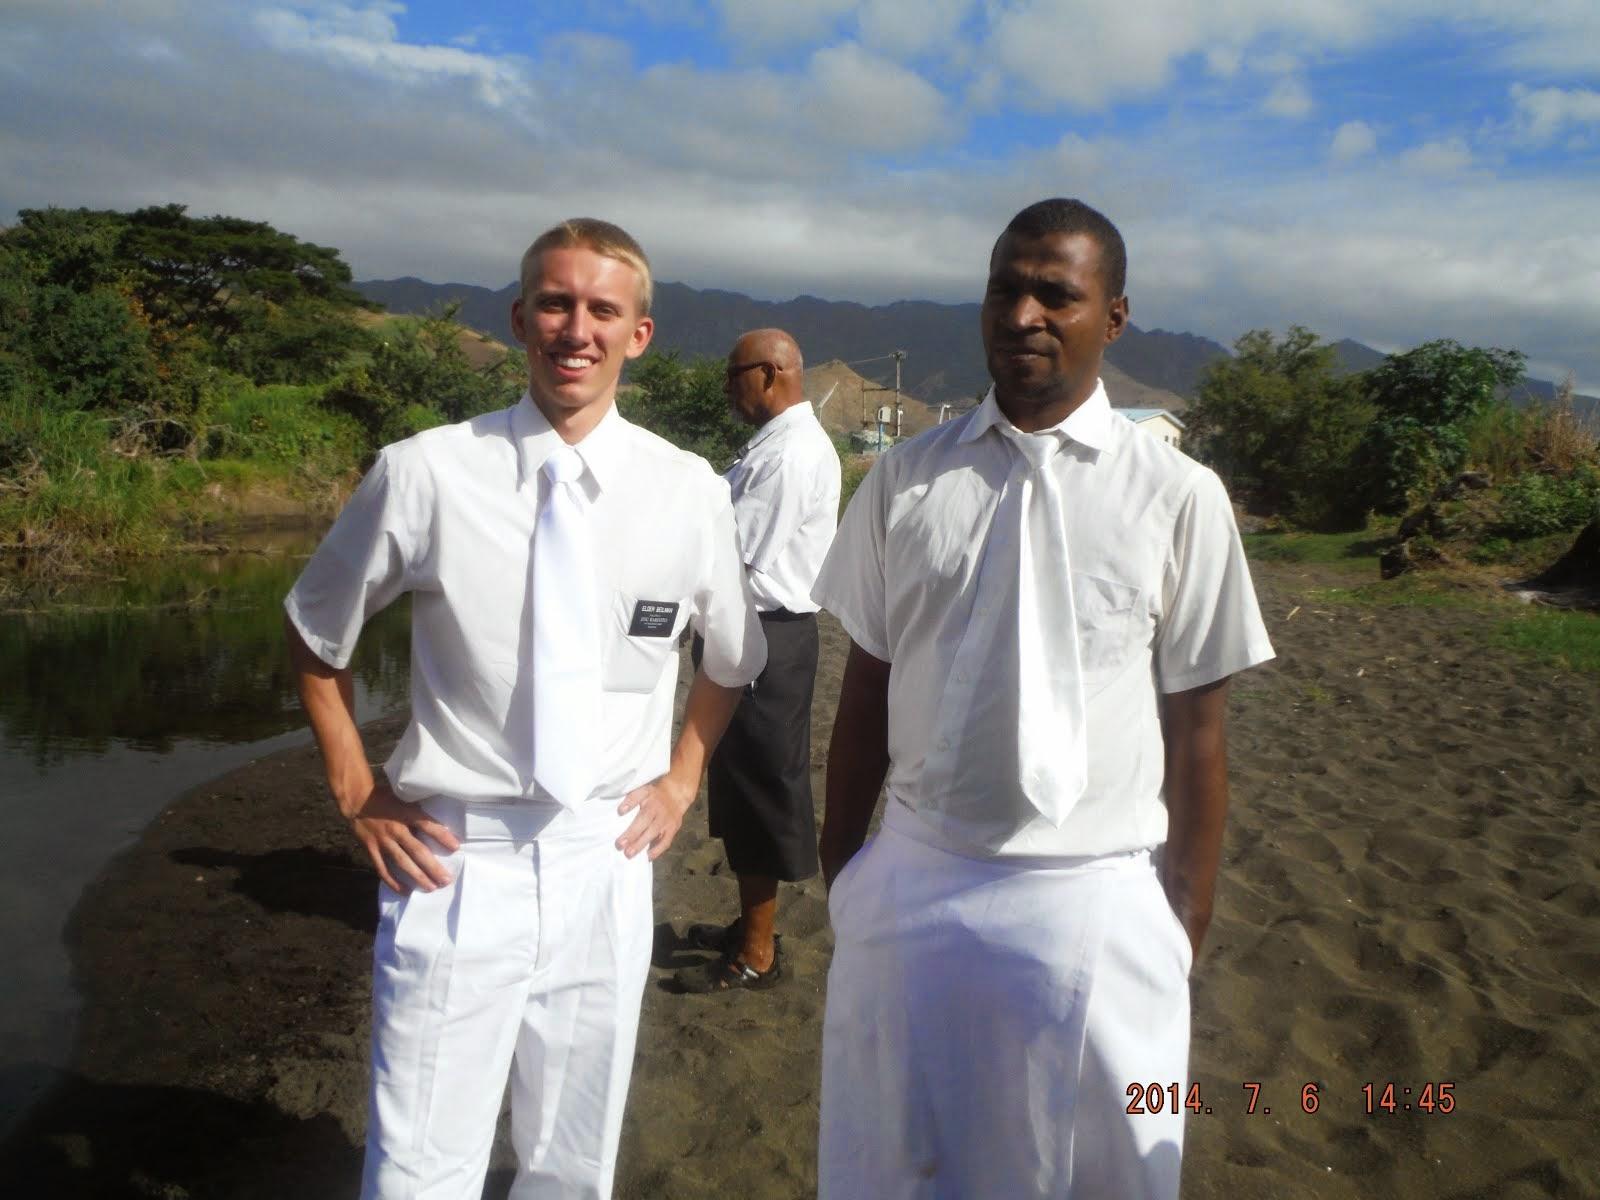 Buka's Baptism